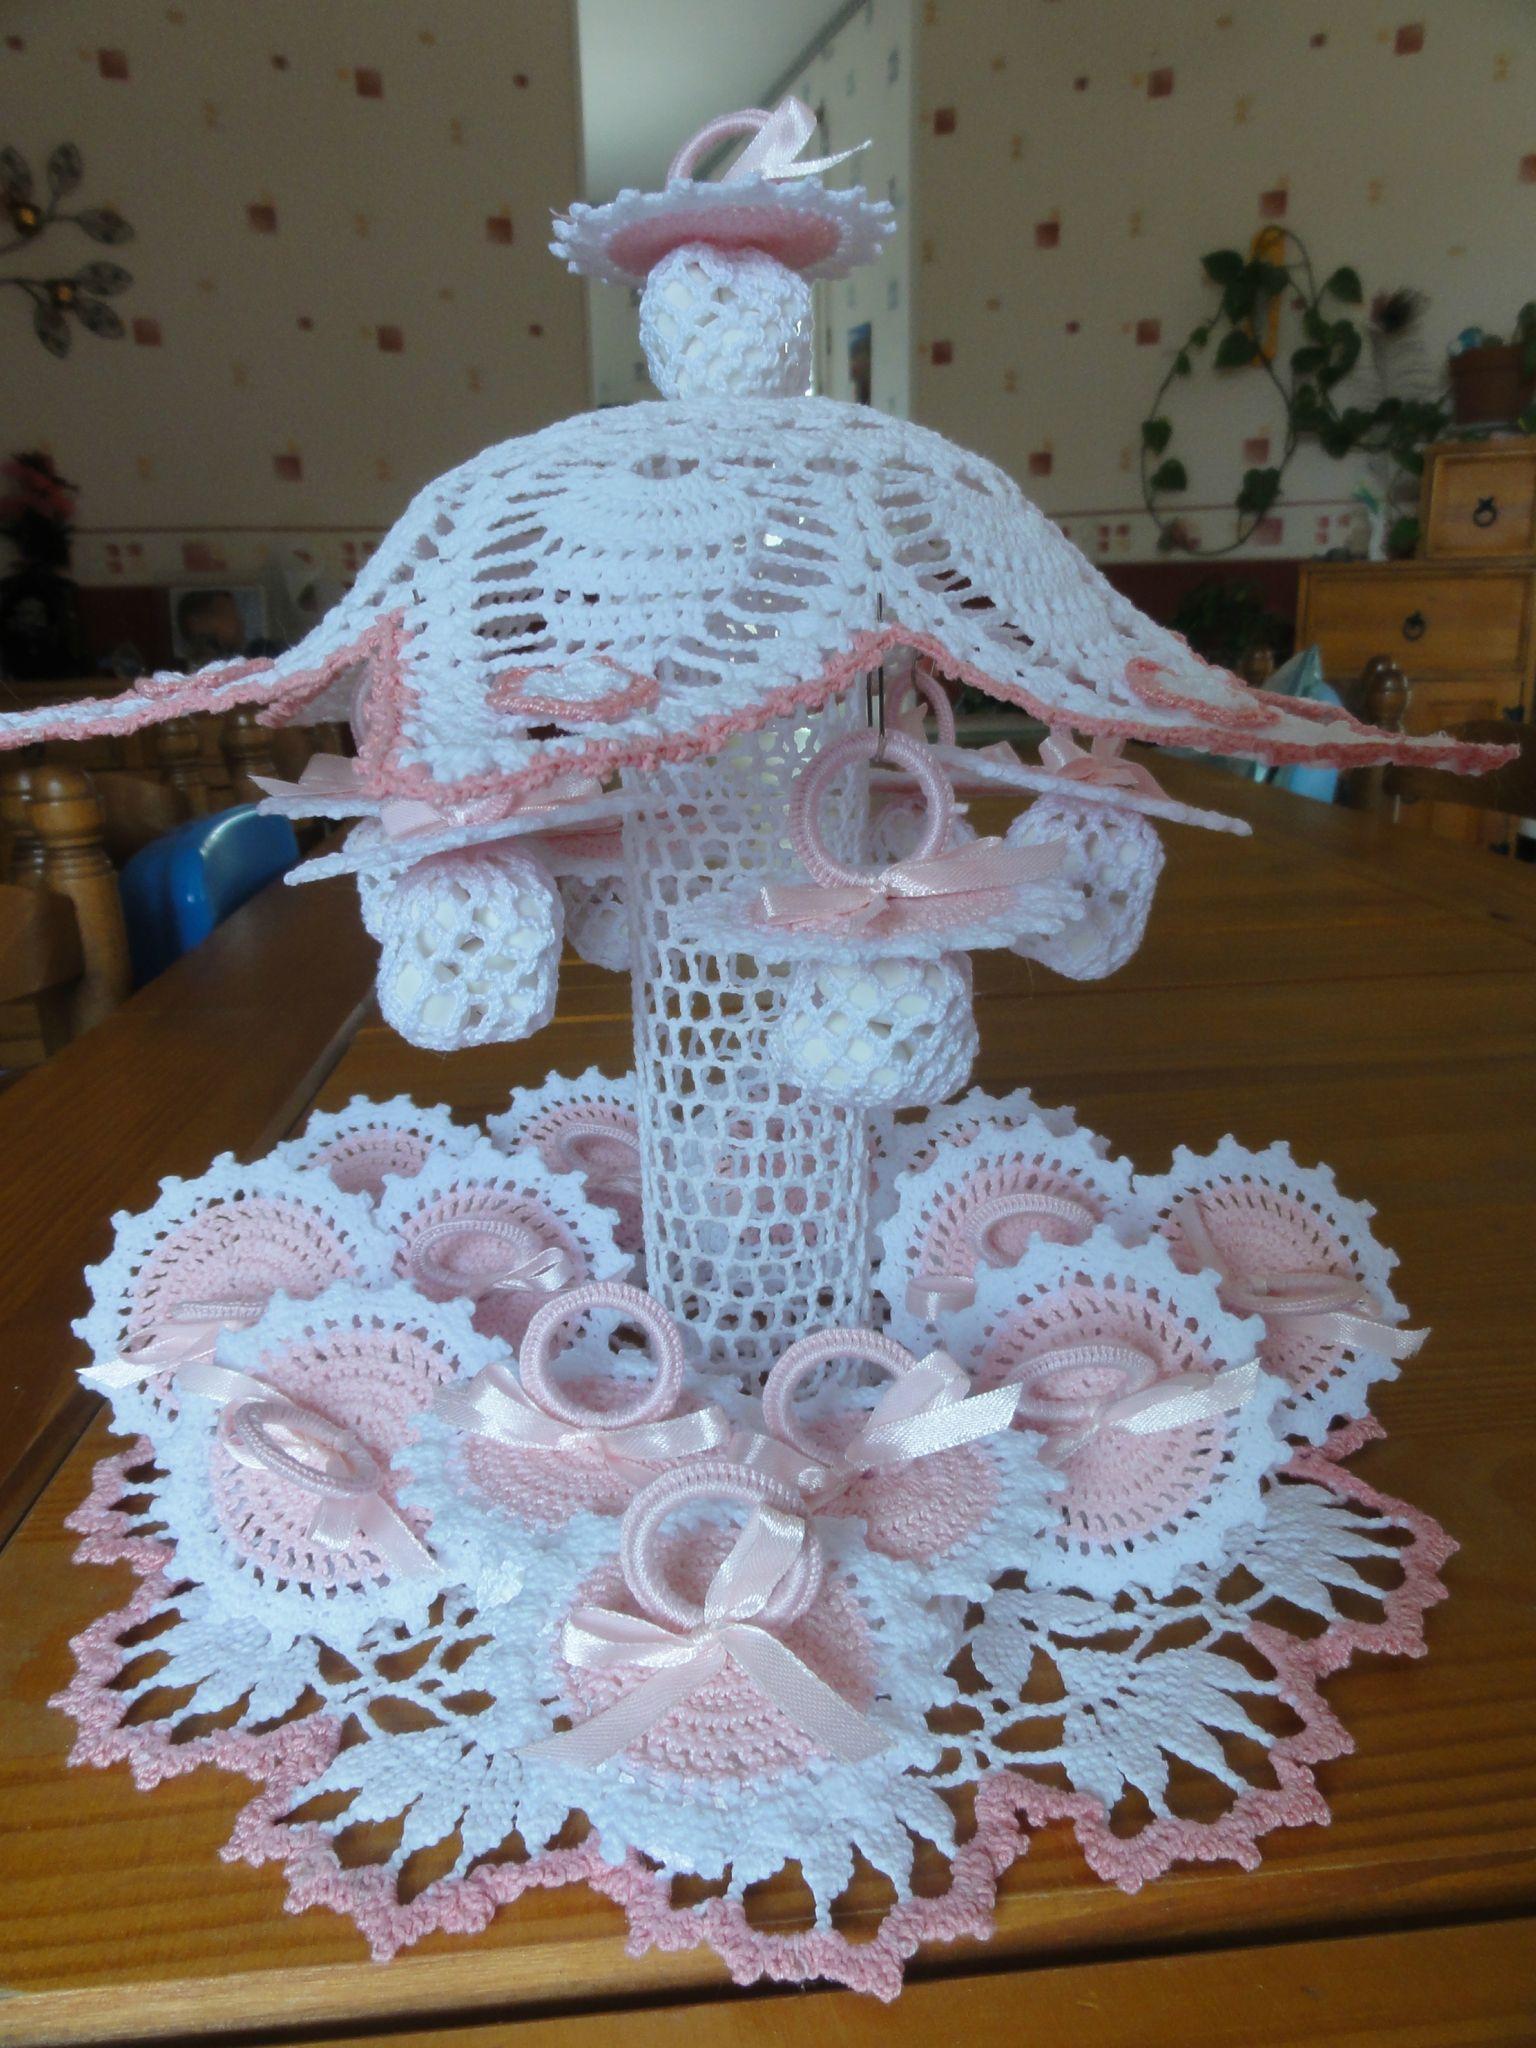 arbre t tines la boutique du crochet de lili. Black Bedroom Furniture Sets. Home Design Ideas